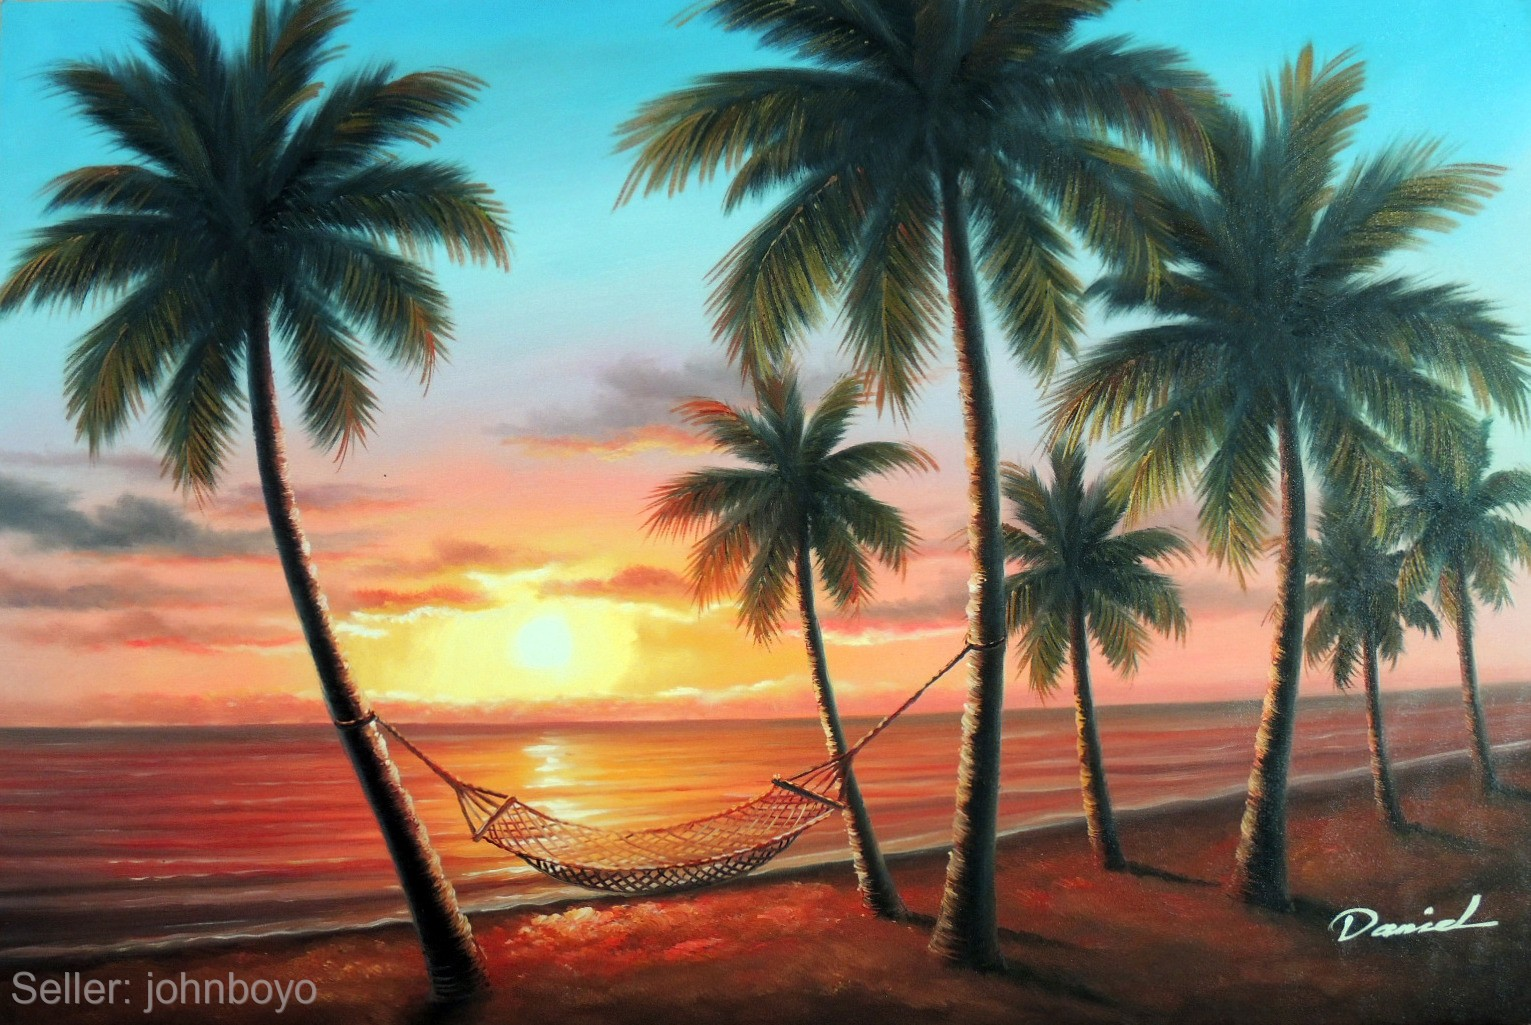 Hawaii Sunset Beach Hammock Island Shore Palm Tree